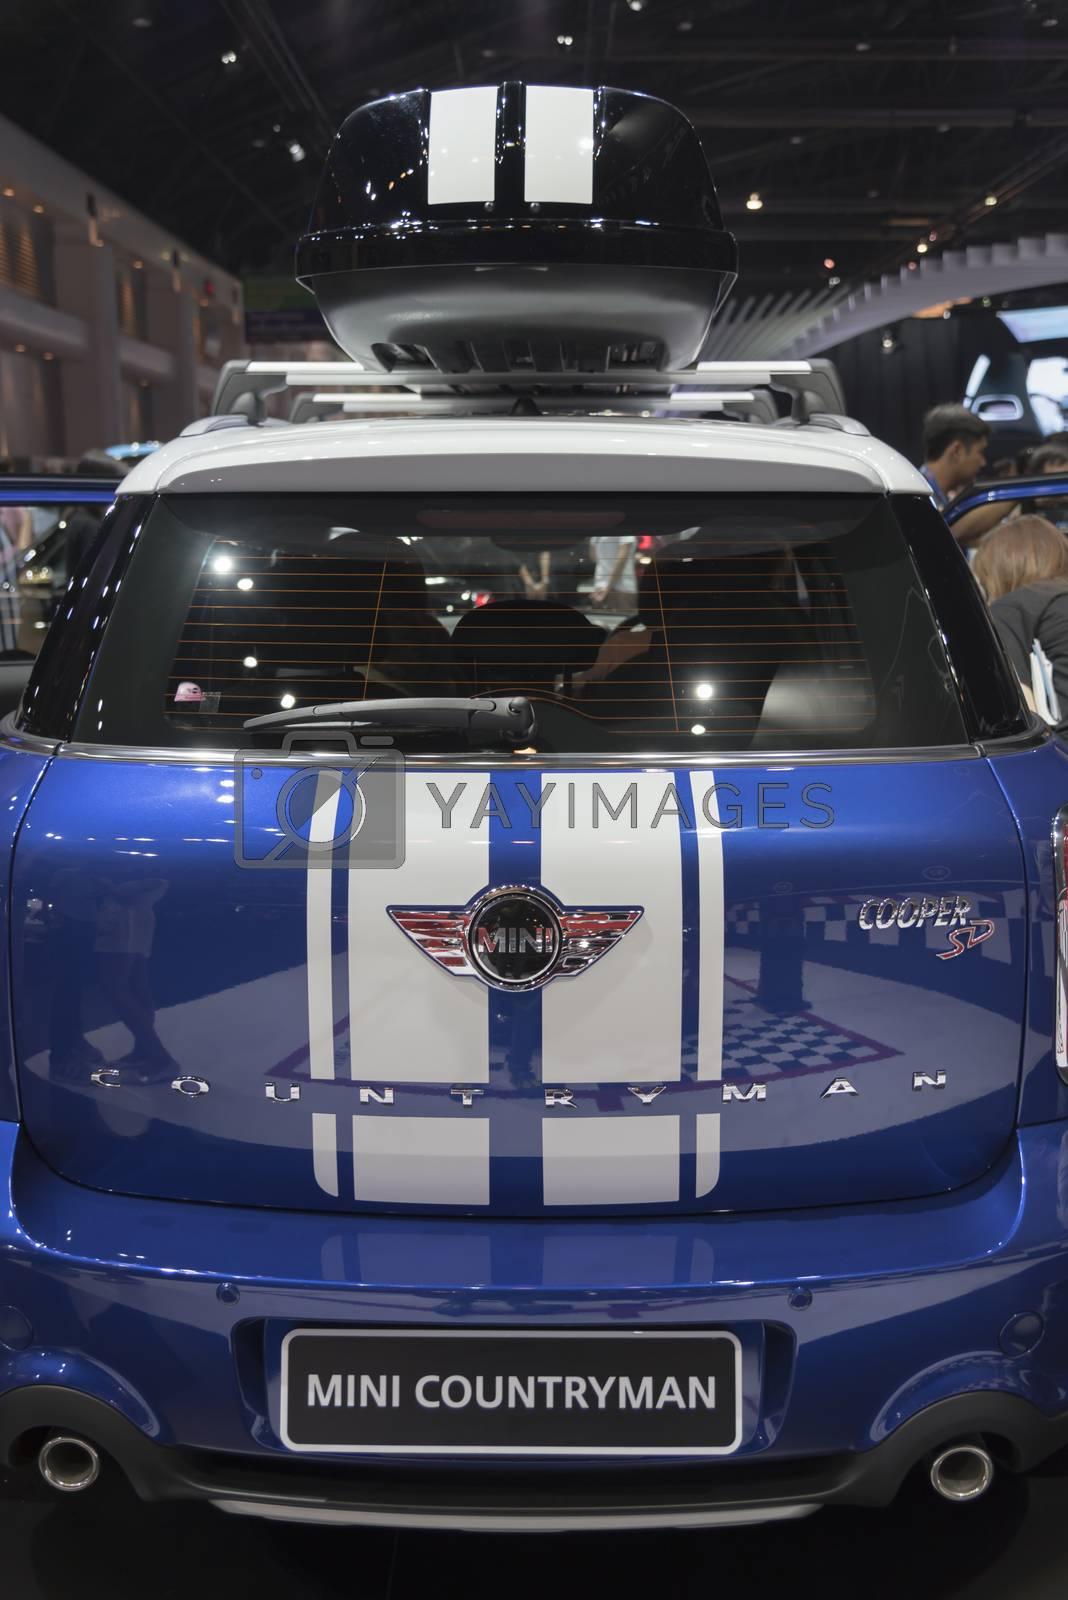 BANGKOK,THAILAND - APRIL 4 : car brand mini on April 4,2015 at the 36th Bangkok international motor show in Thailand.Blue color of mini countryman car brand.